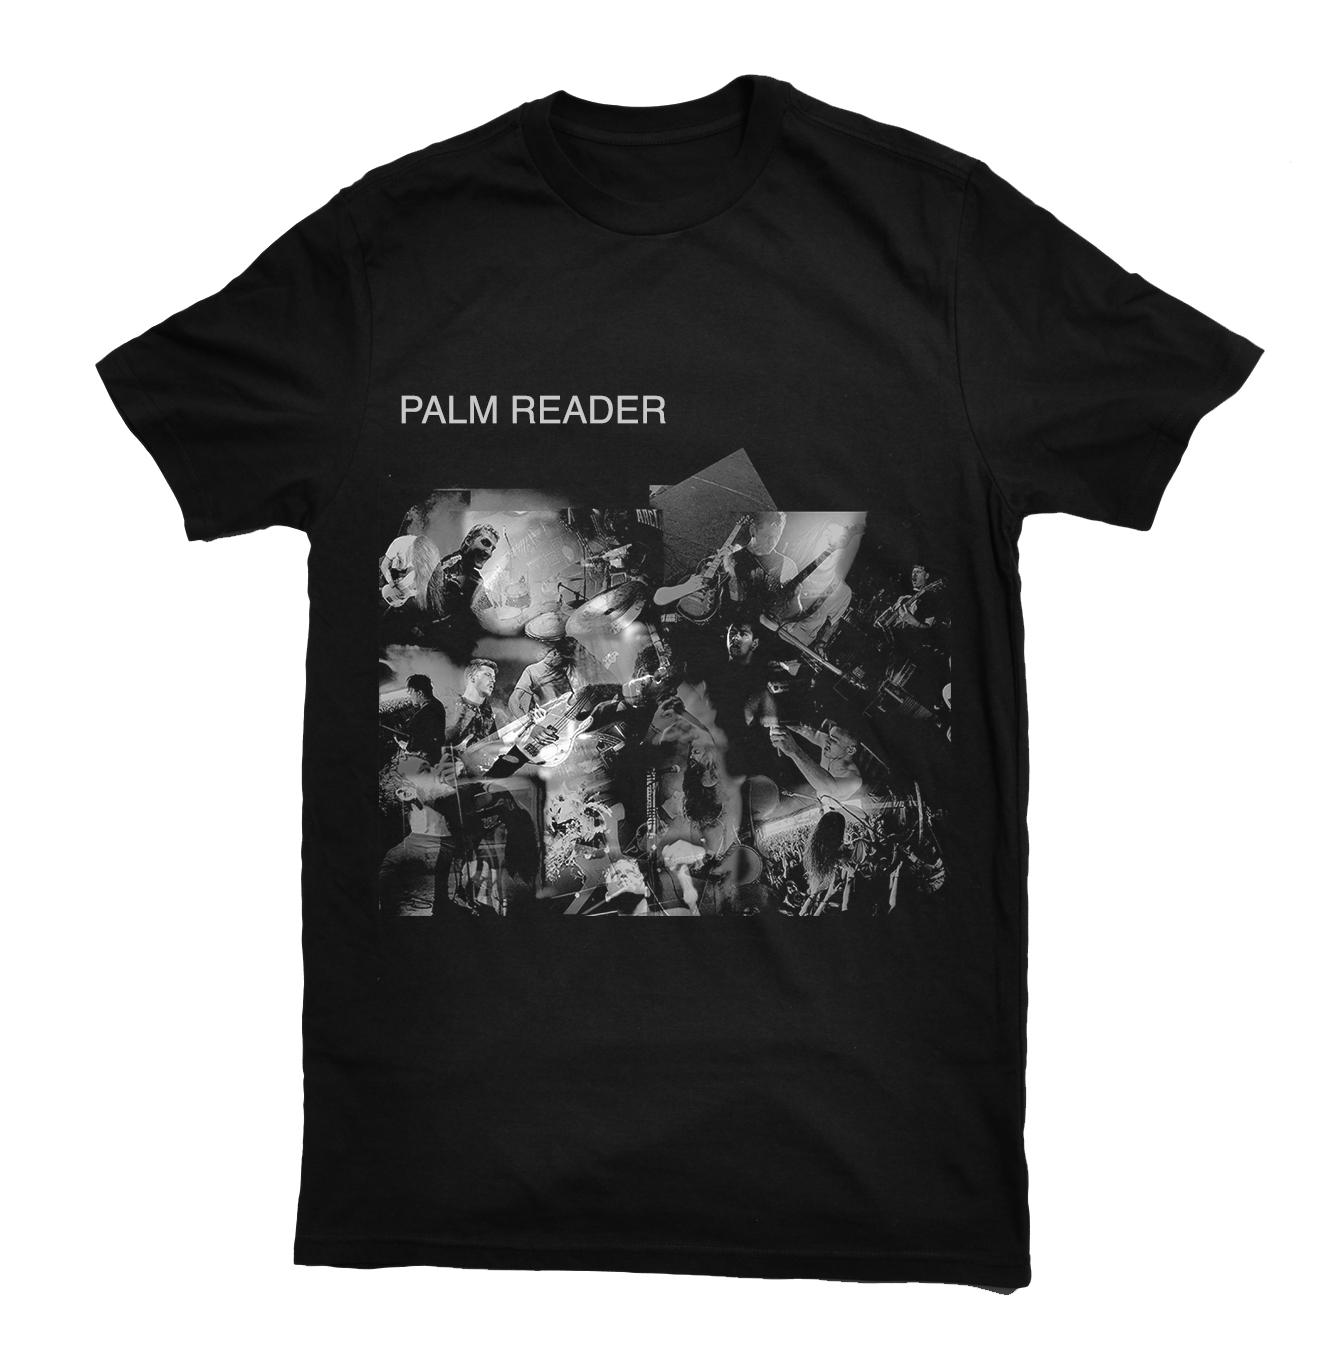 Conjurer & Palm Reader - Palm Reader shirt PREORDER